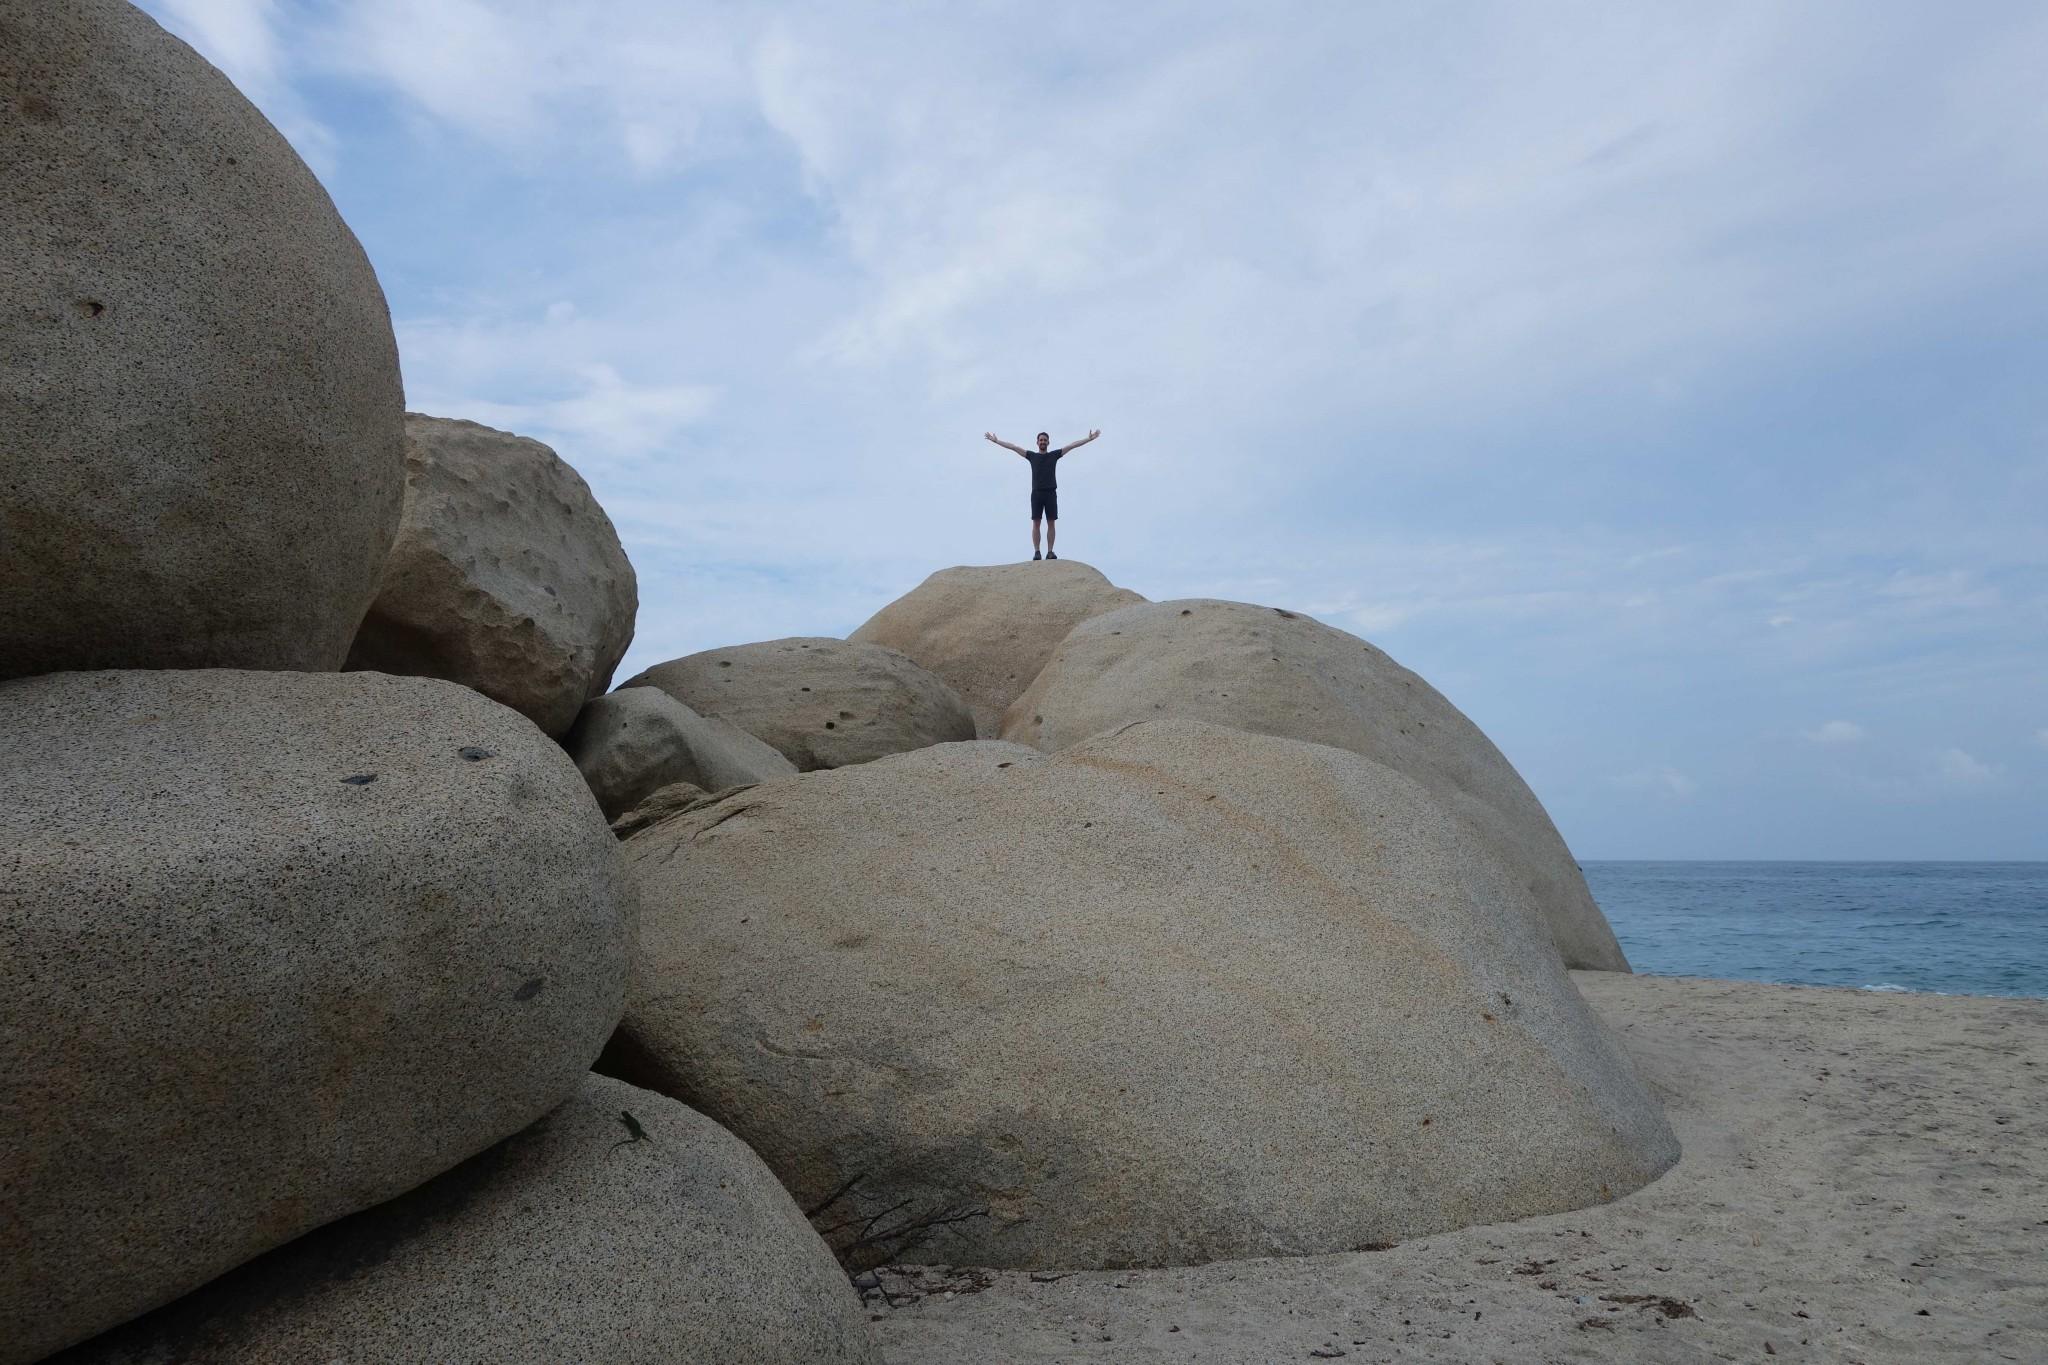 Parque Tayrona große Felsen am Strand